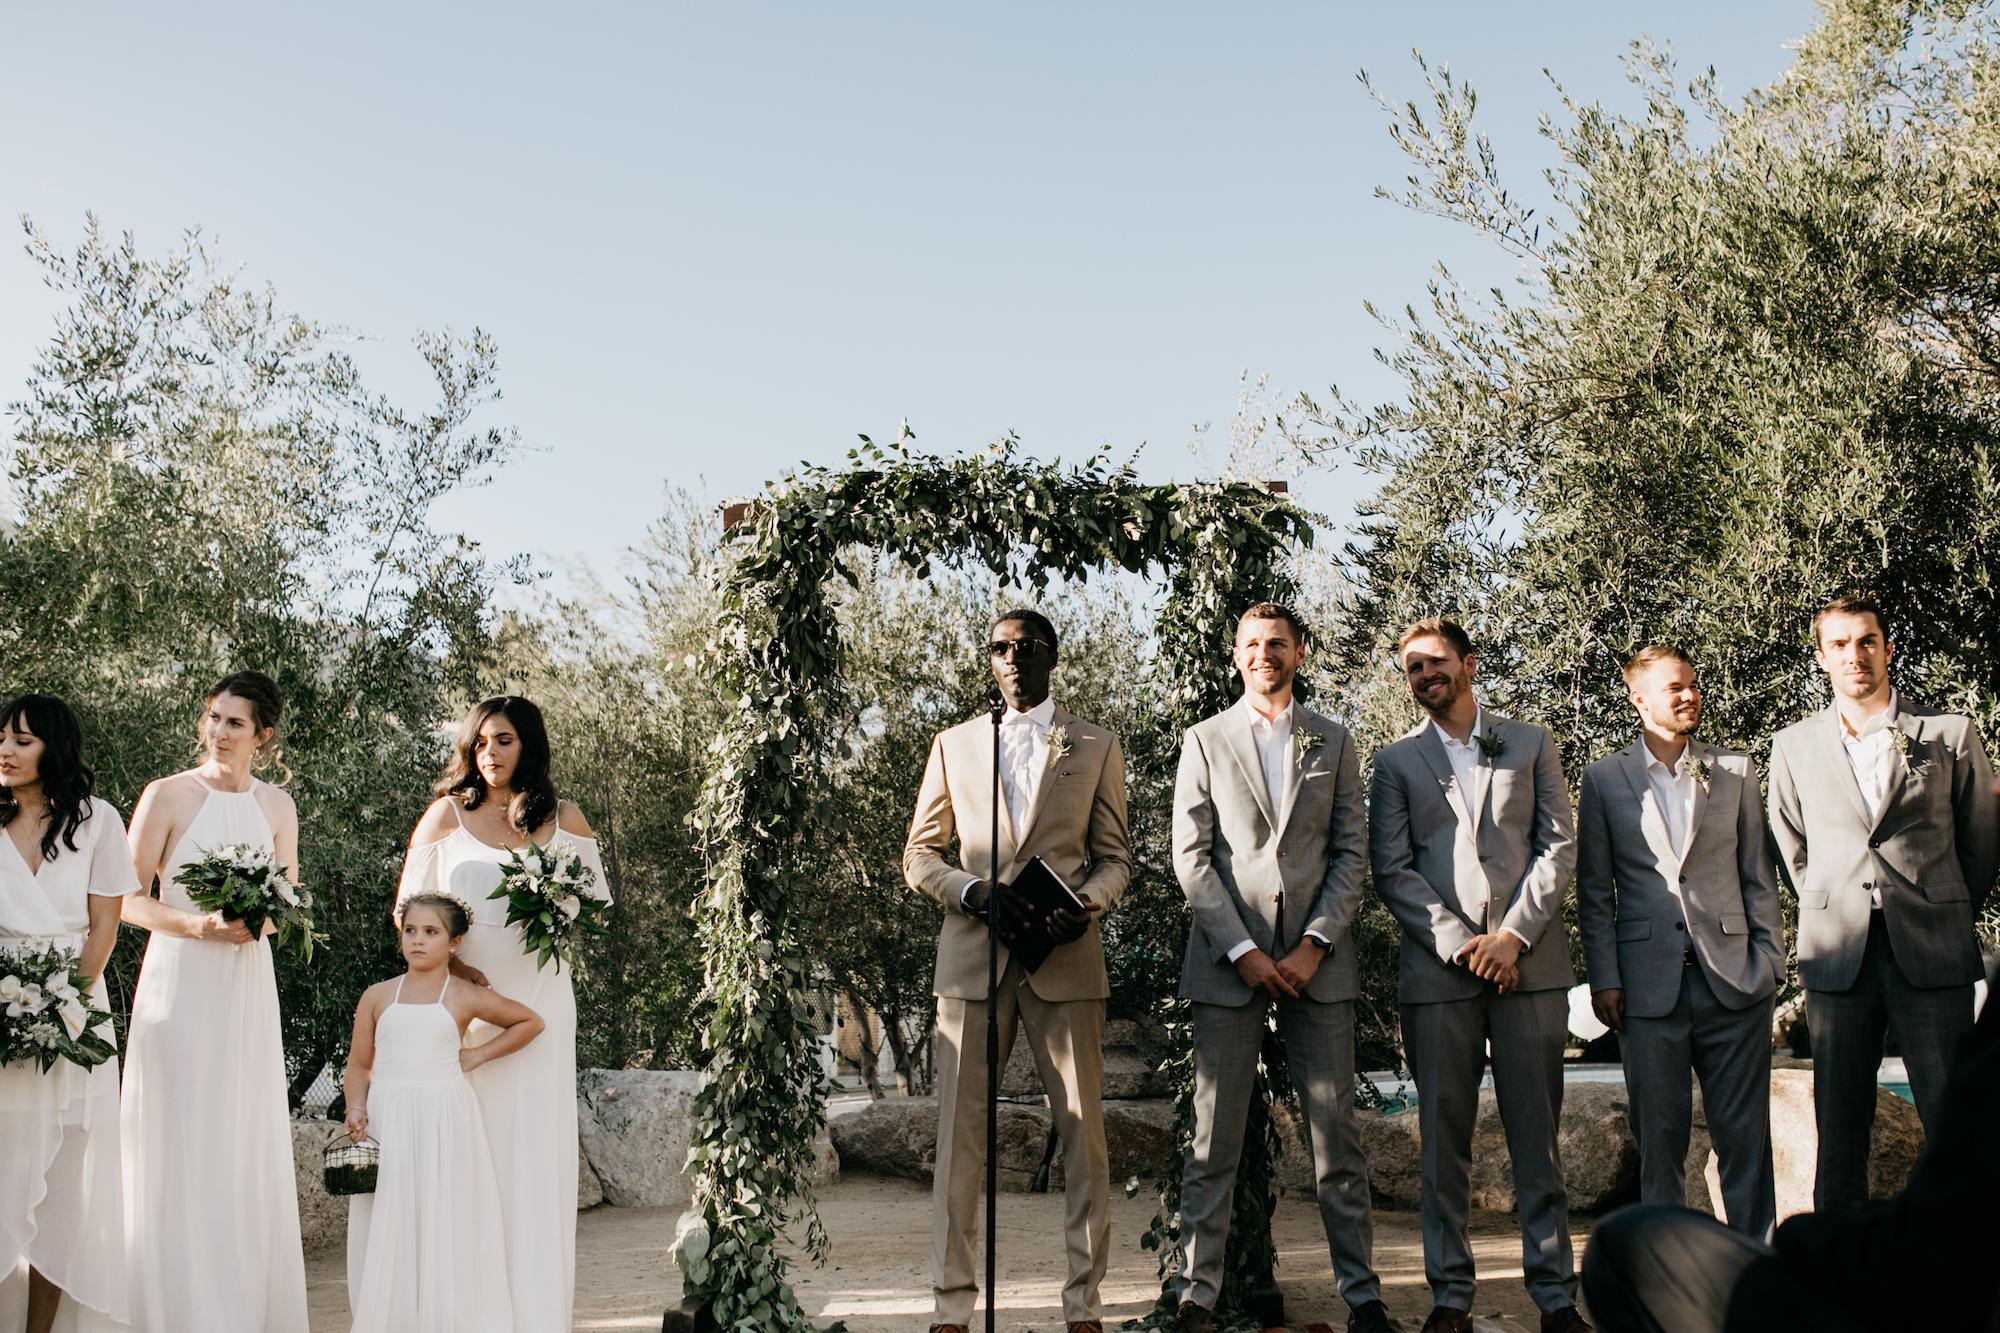 ace-hotel-palm-springs-wedding-photographer495.jpg